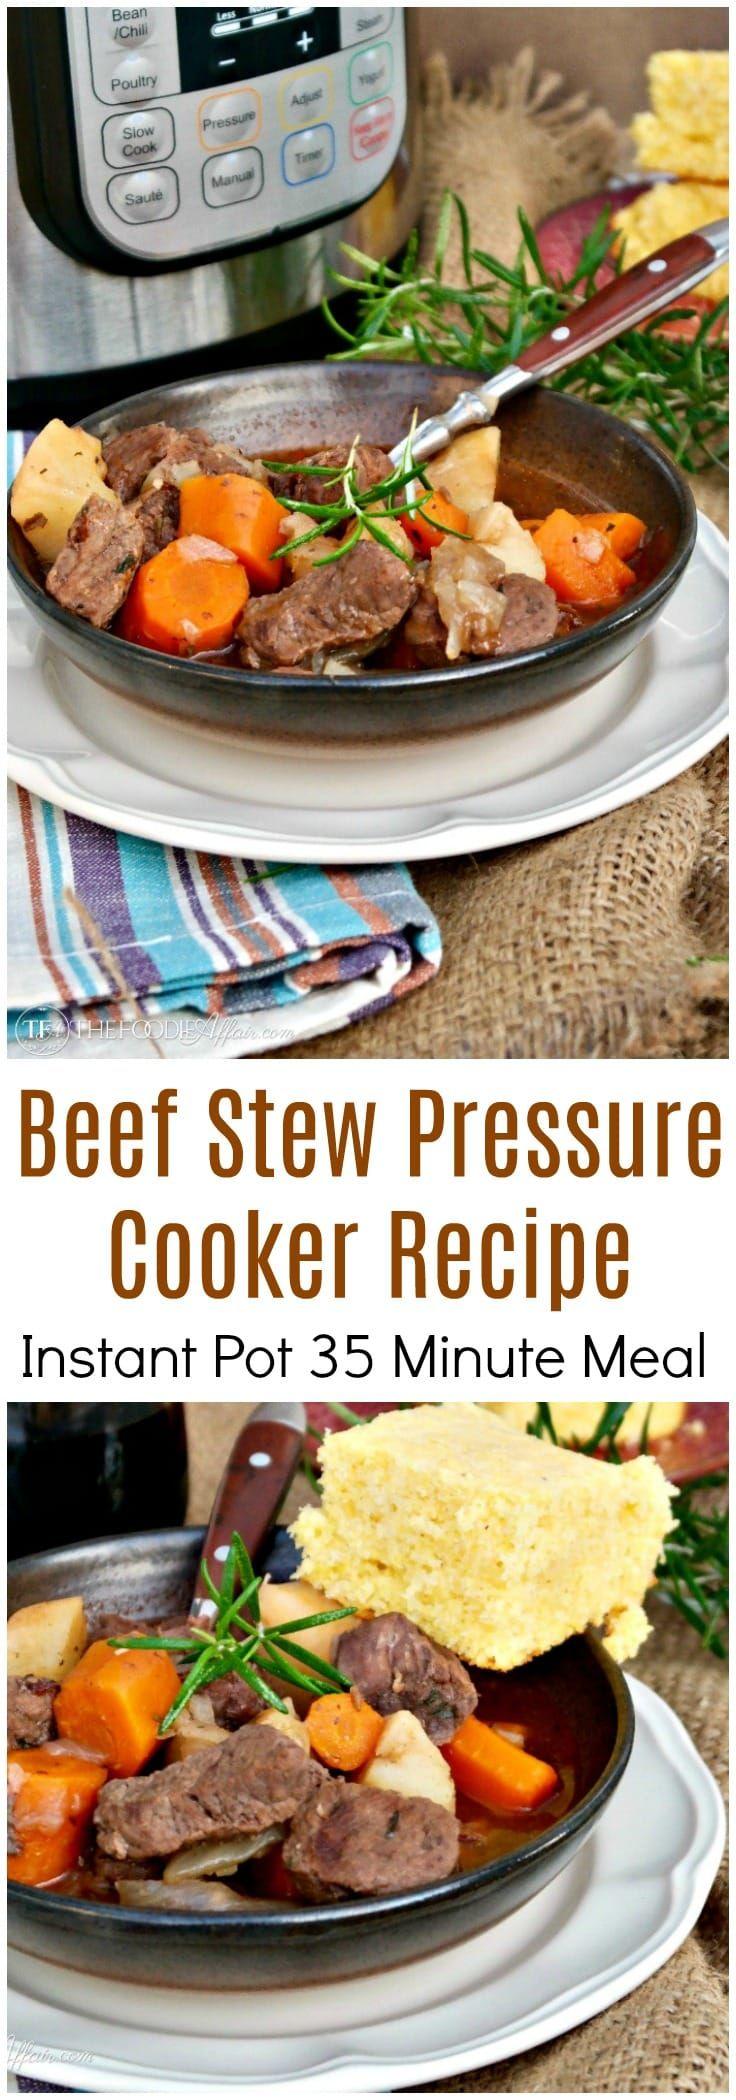 Pressure Cooker Beef Stew 35 Minute Recipe The Foodie Affair Recipe Pressure Cooker Beef Stew Pressure Cooker Recipes Recipes